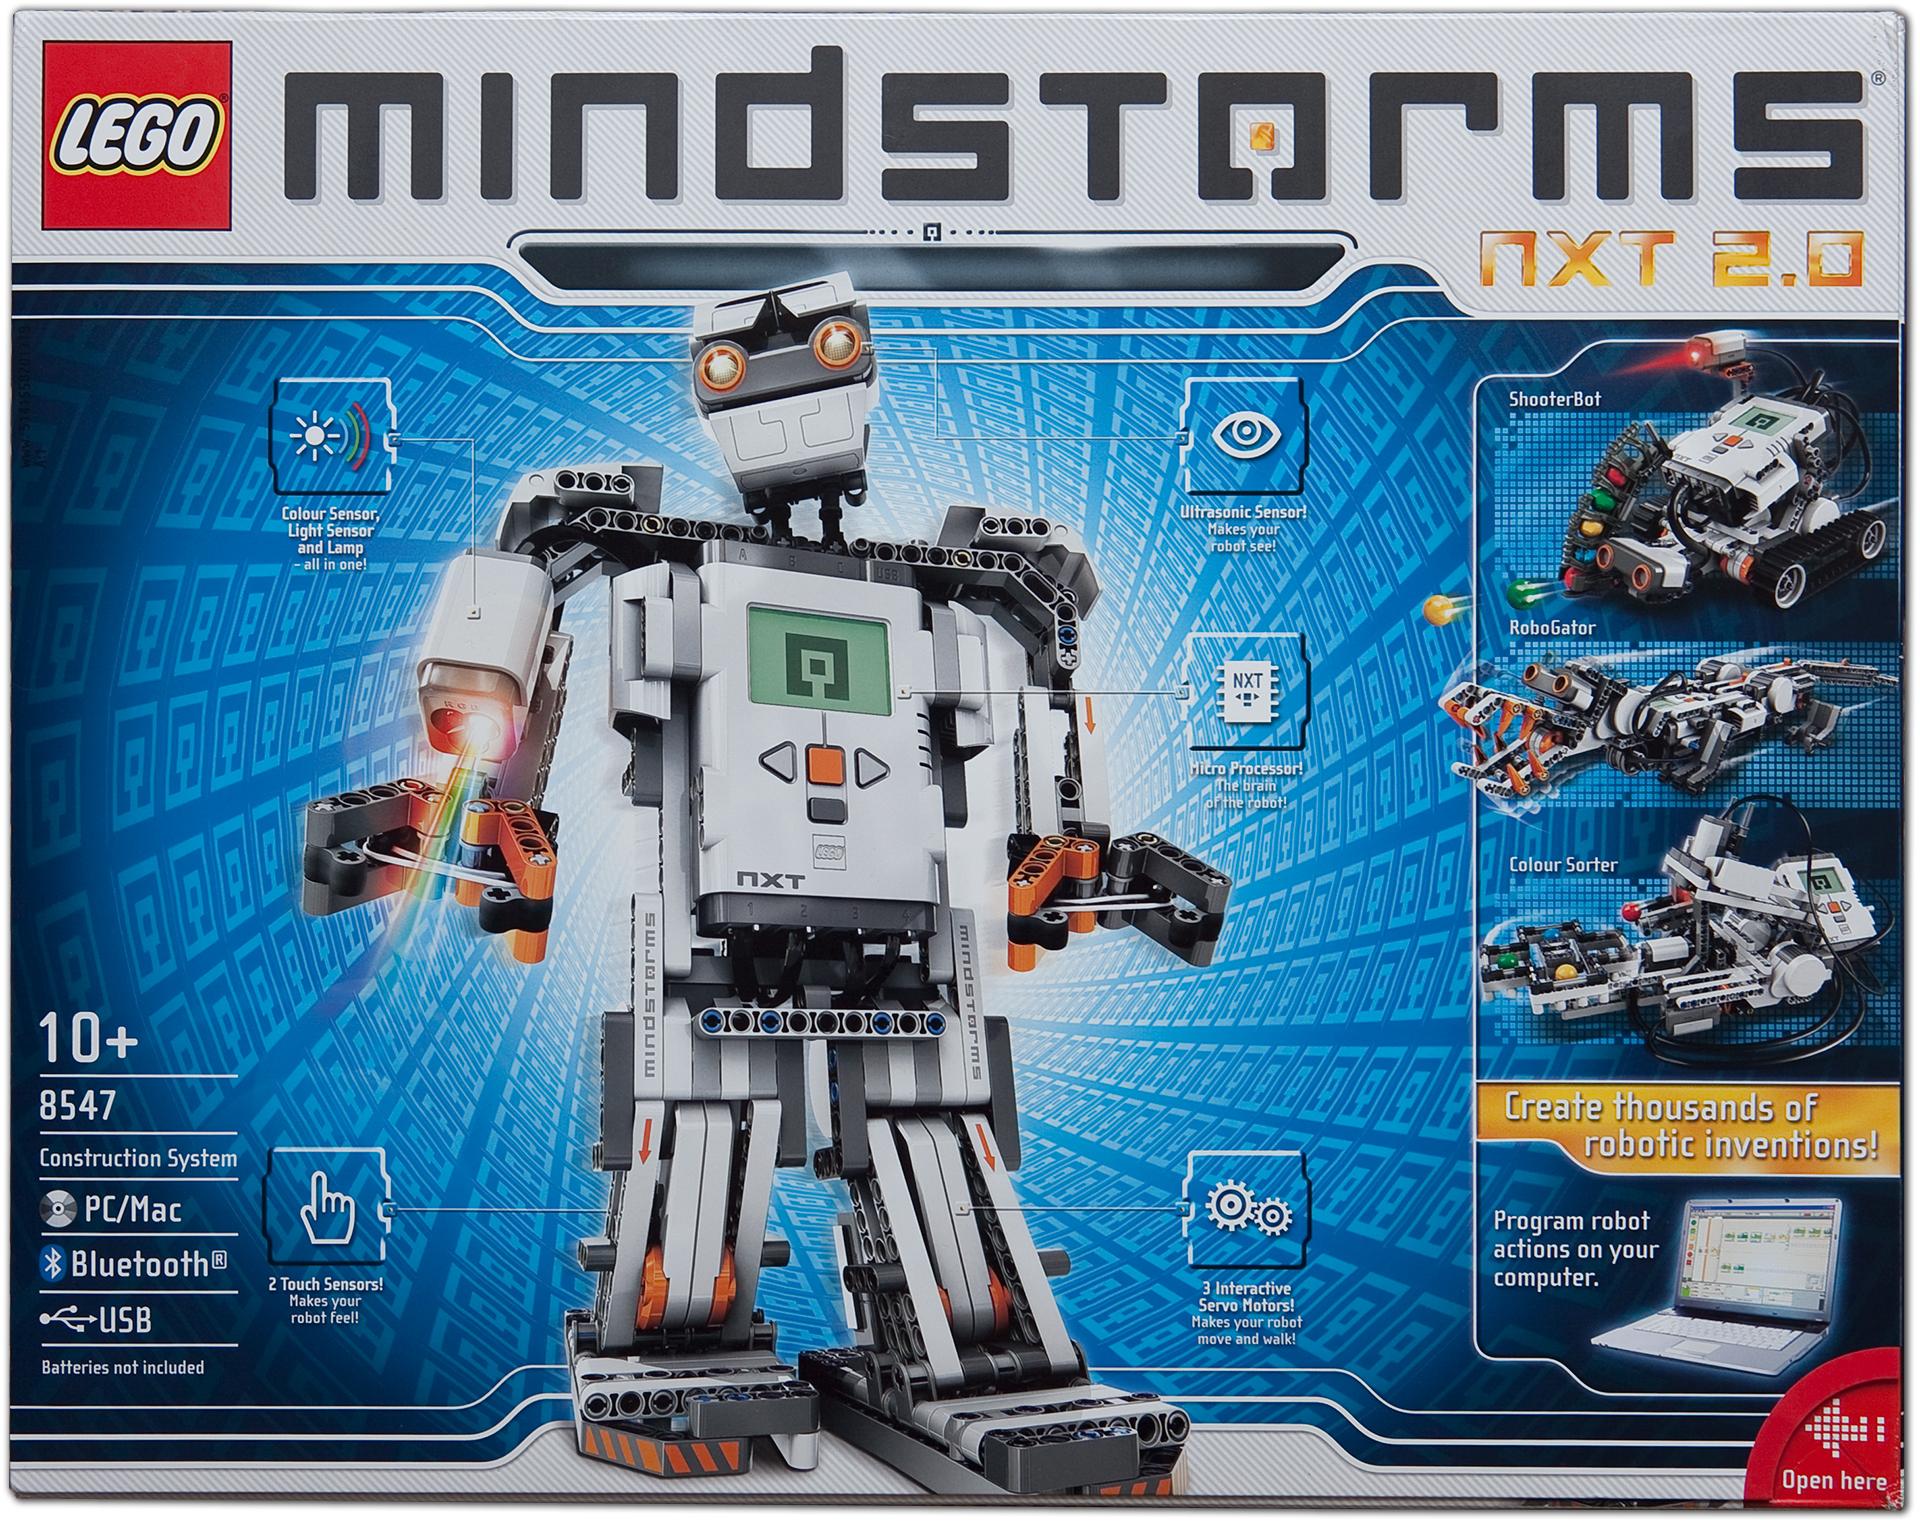 Download the lego mindstorms ev3 education software (for free.